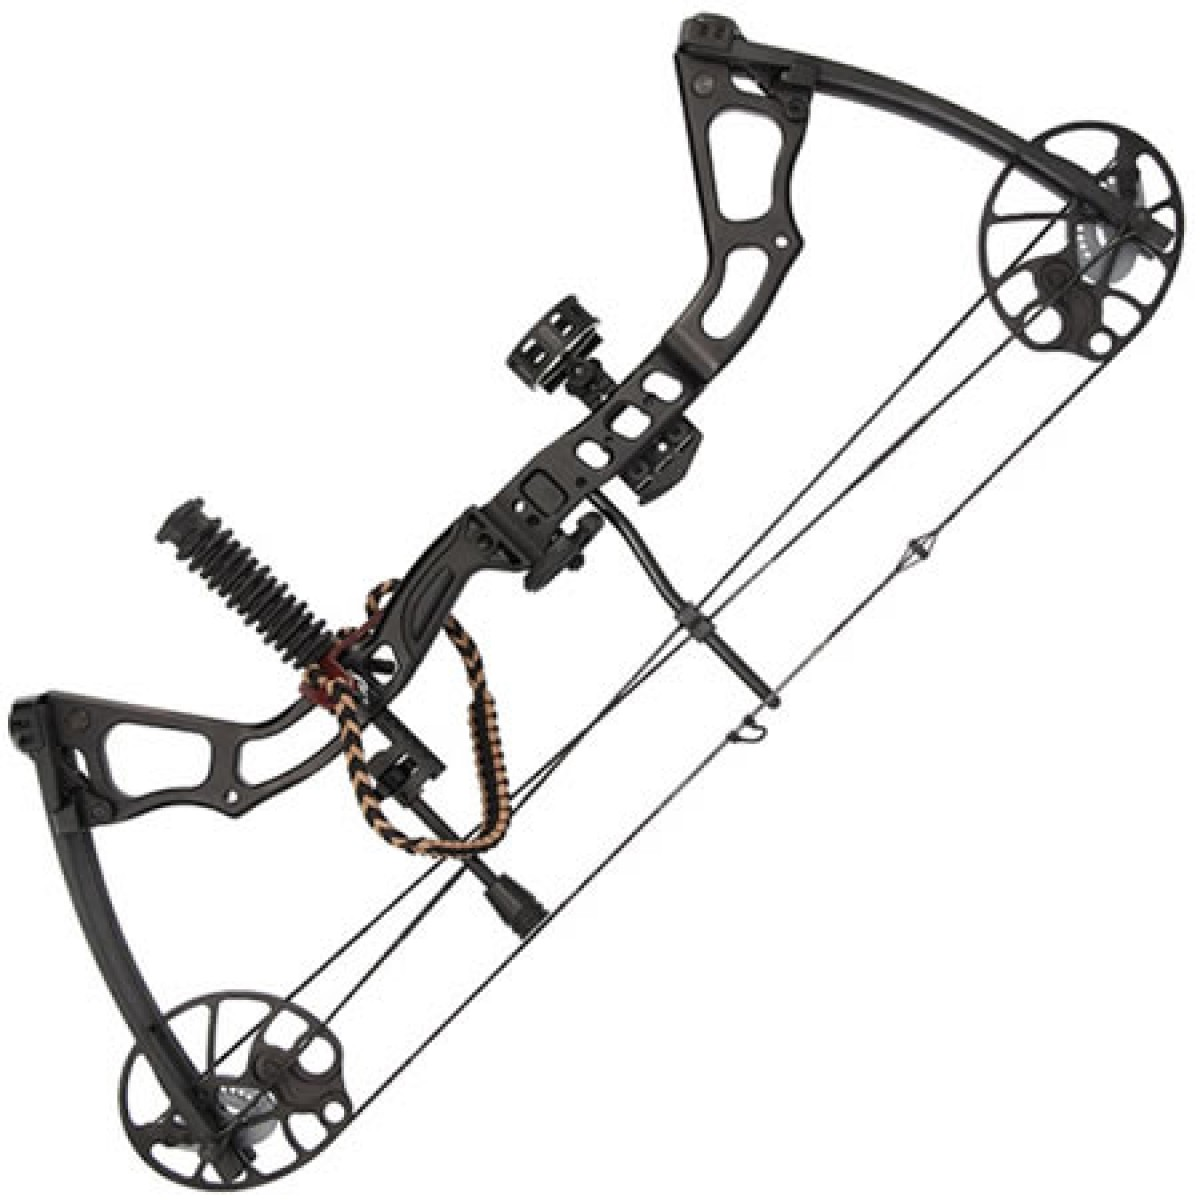 1200x1200 Barringtons Swords Chikara 15 70lb Compound Bow